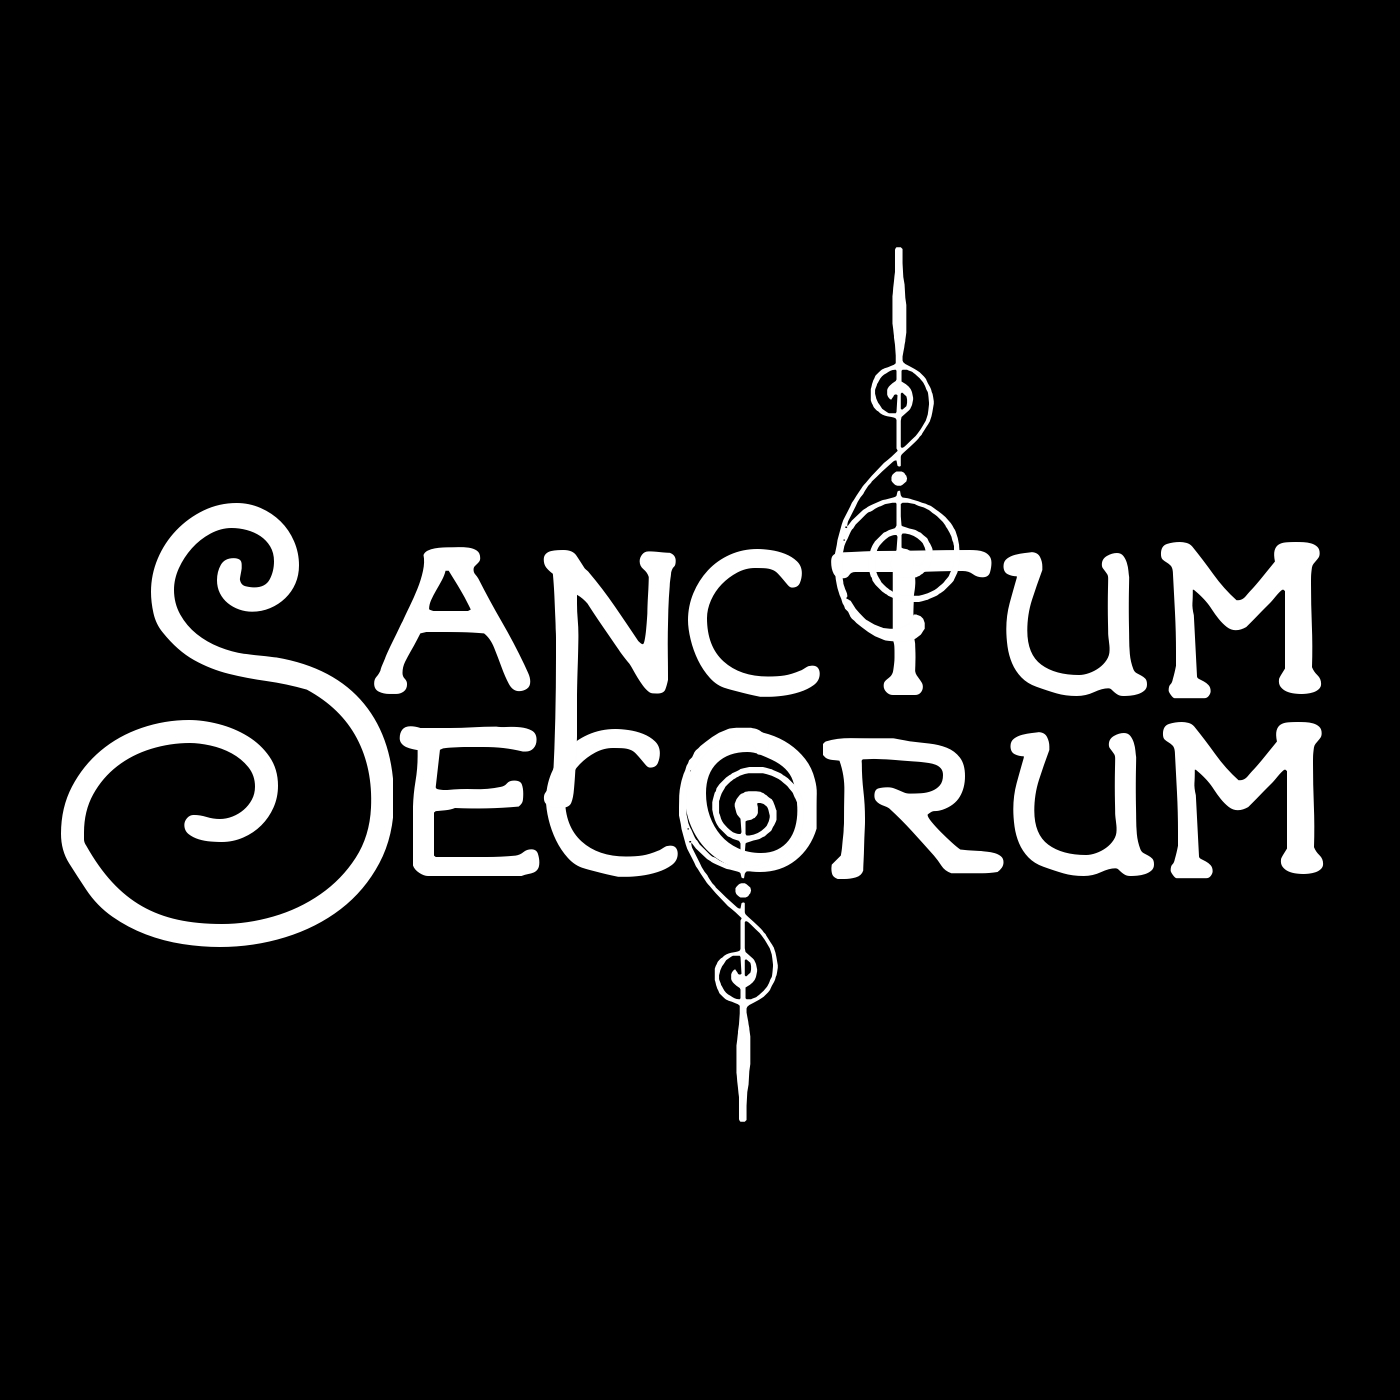 Sanctum Secorum #34 - The Face in the Frost